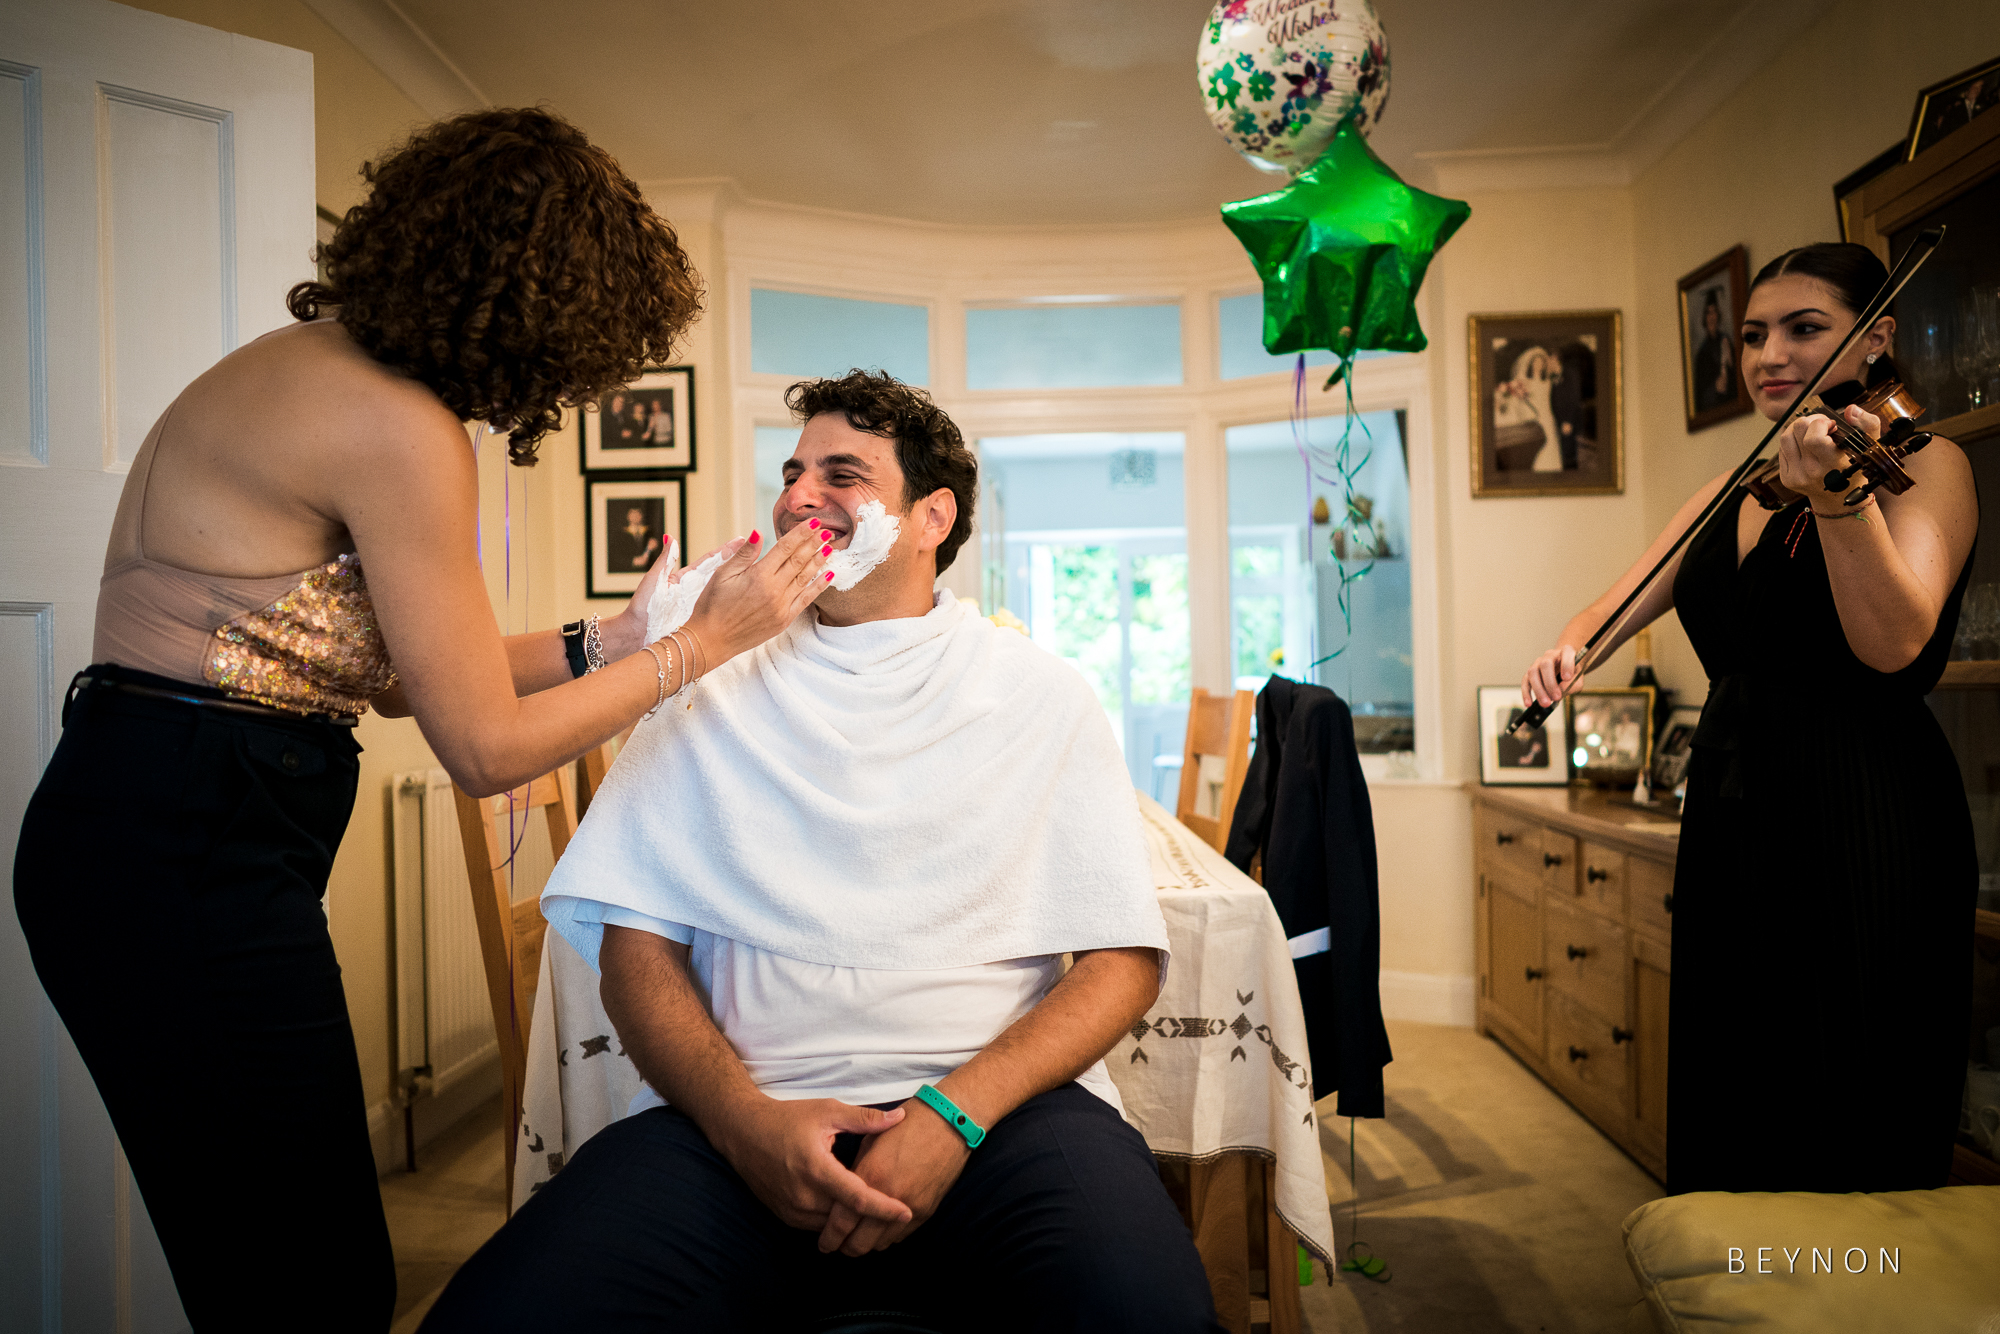 The Koumbaro shaves the Groom